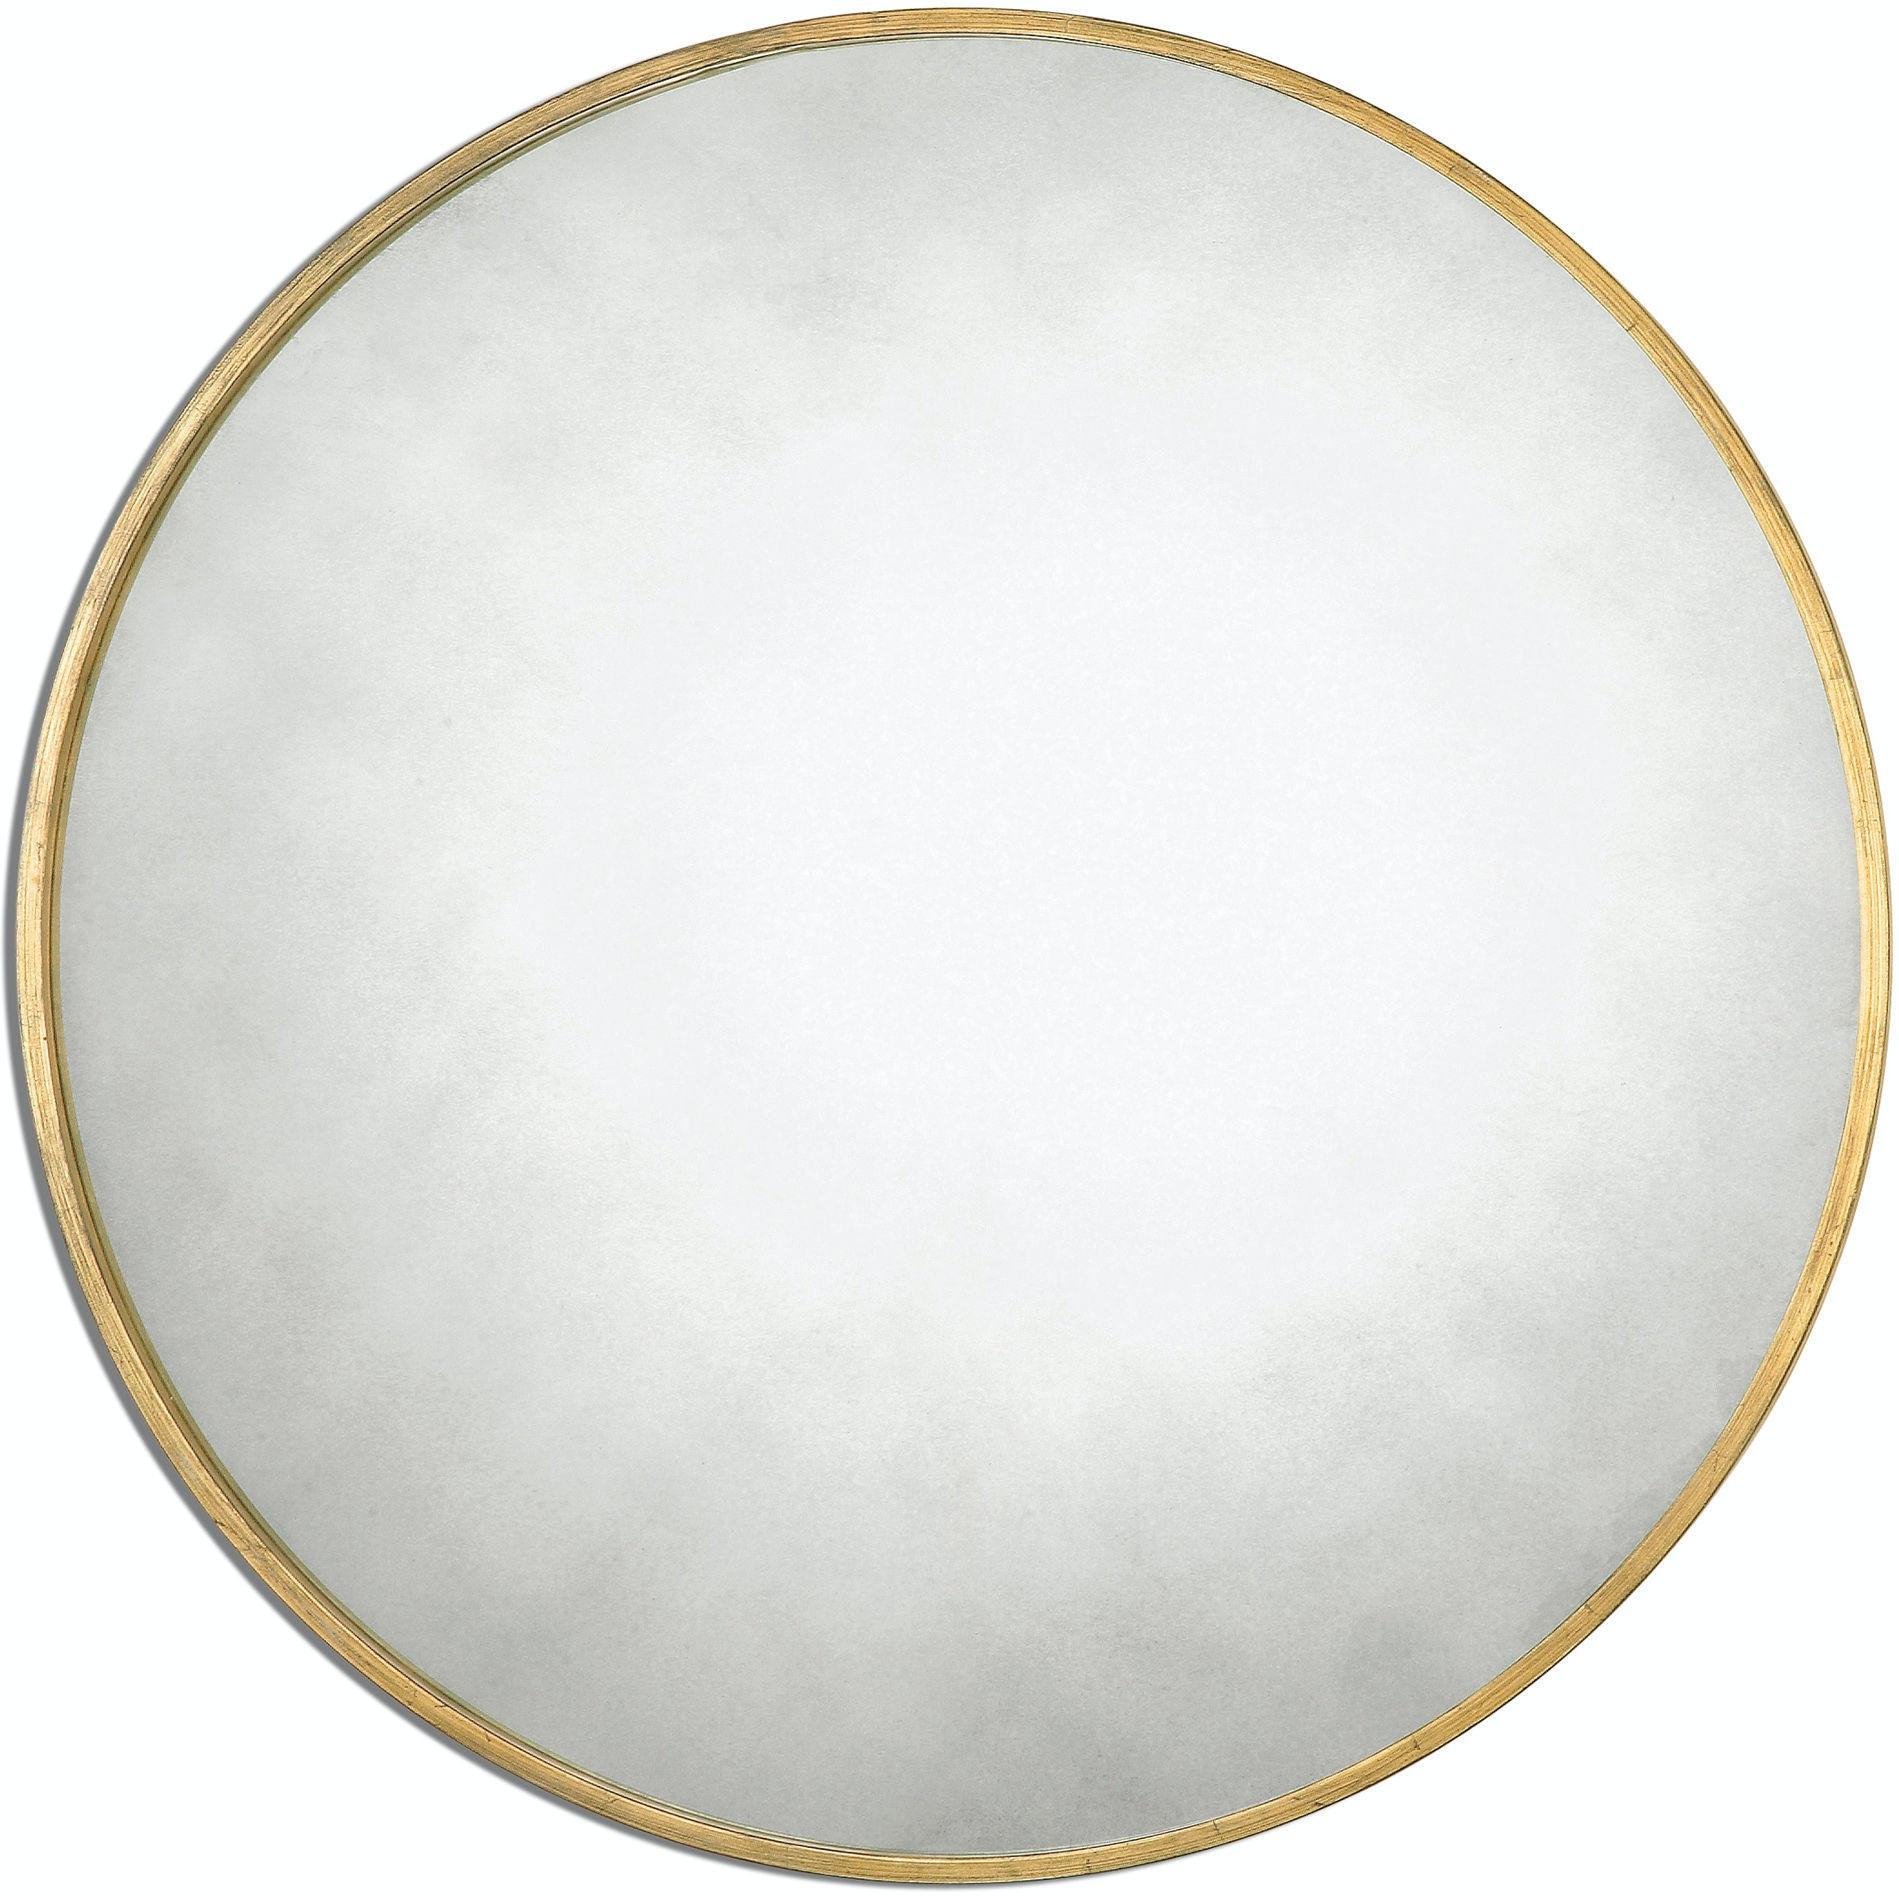 Uttermost Bedroom Junius Round Gold Mirror